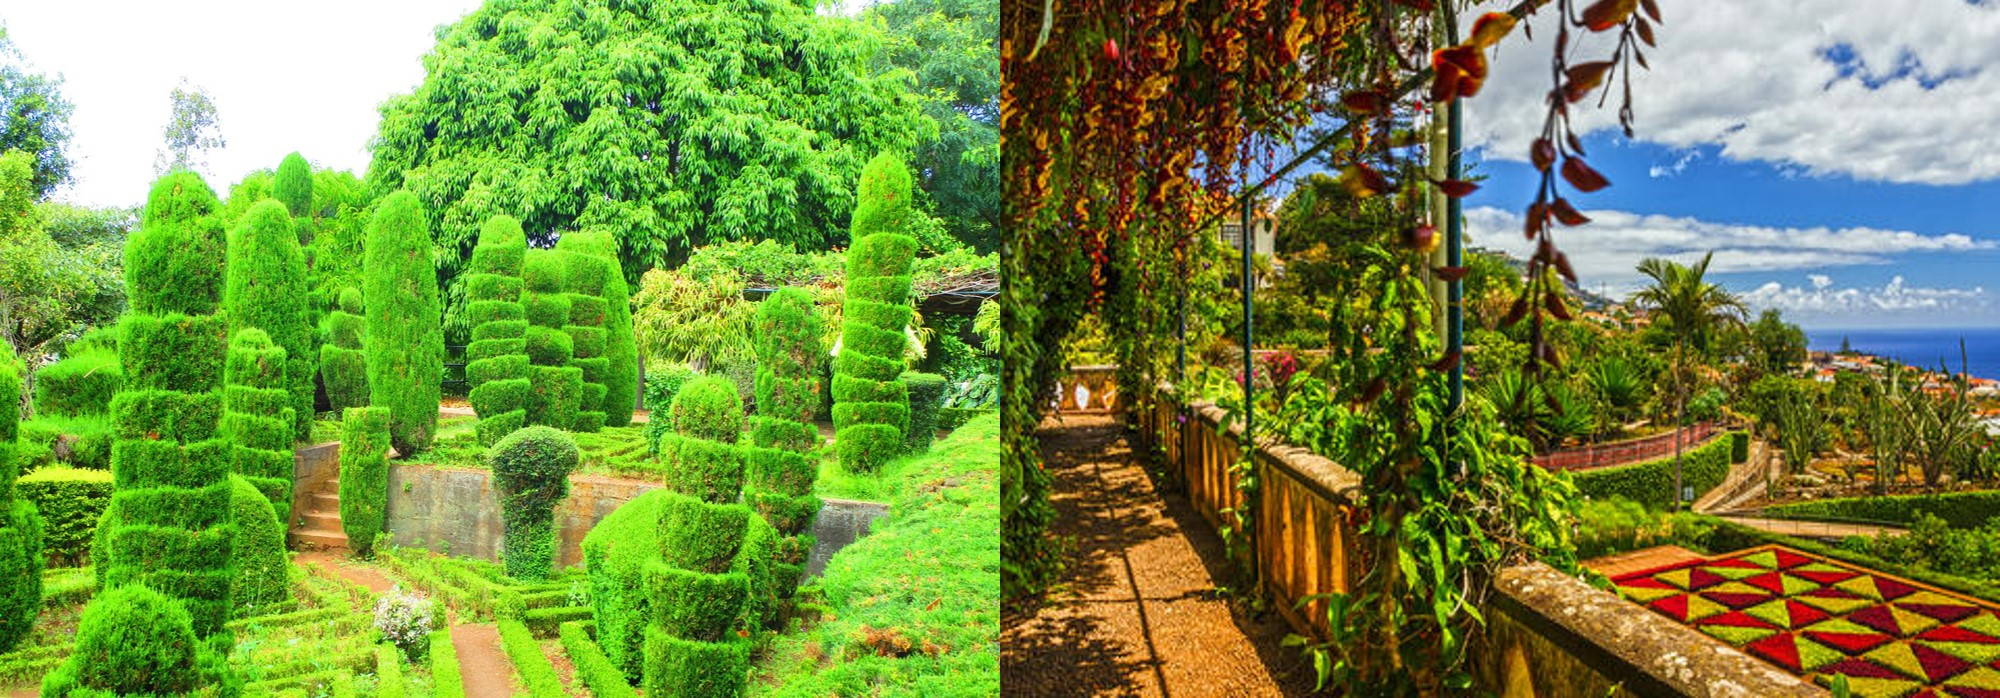 Botanische Gärten Funchal Madeira Portugal